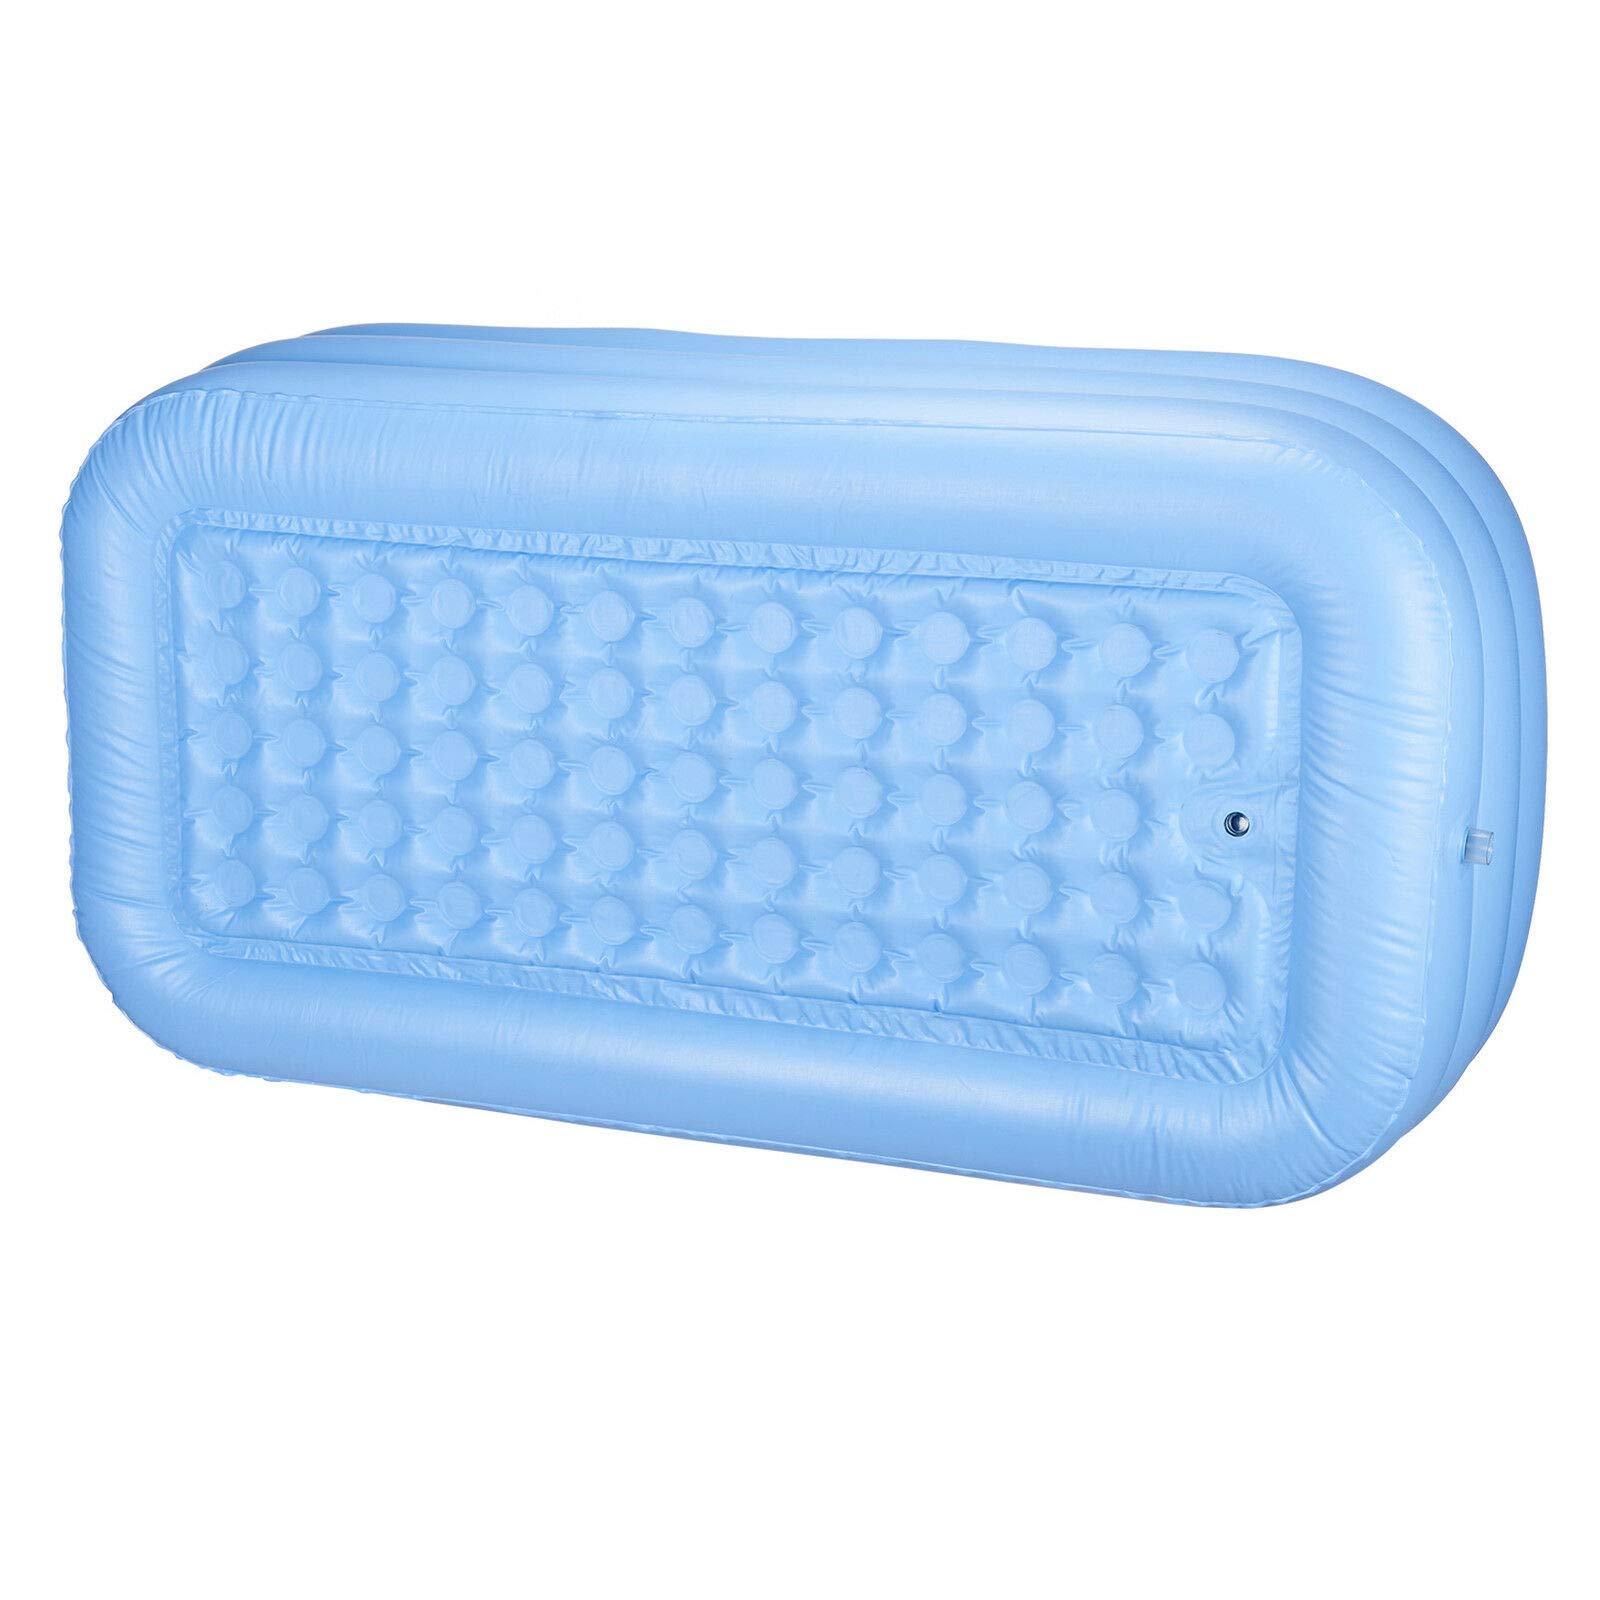 LZHQT Blow Up Adult PVC Folding Portable Foldable Bathtub Inflatable Bath Tub Air Pump by LZHQT (Image #2)